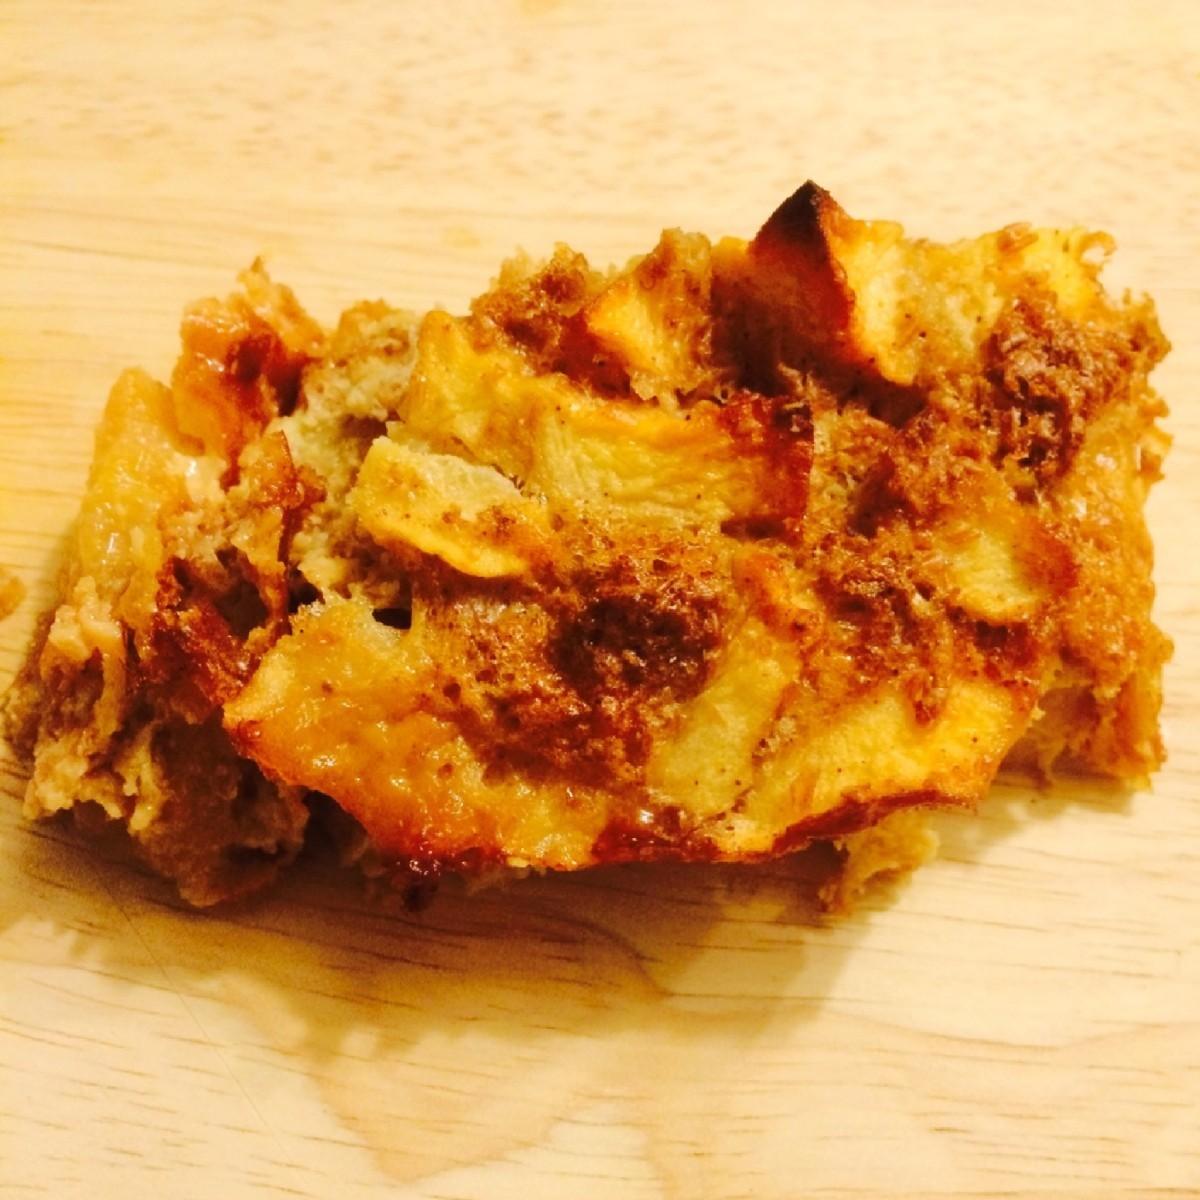 gateau-pommes-proteines-regime